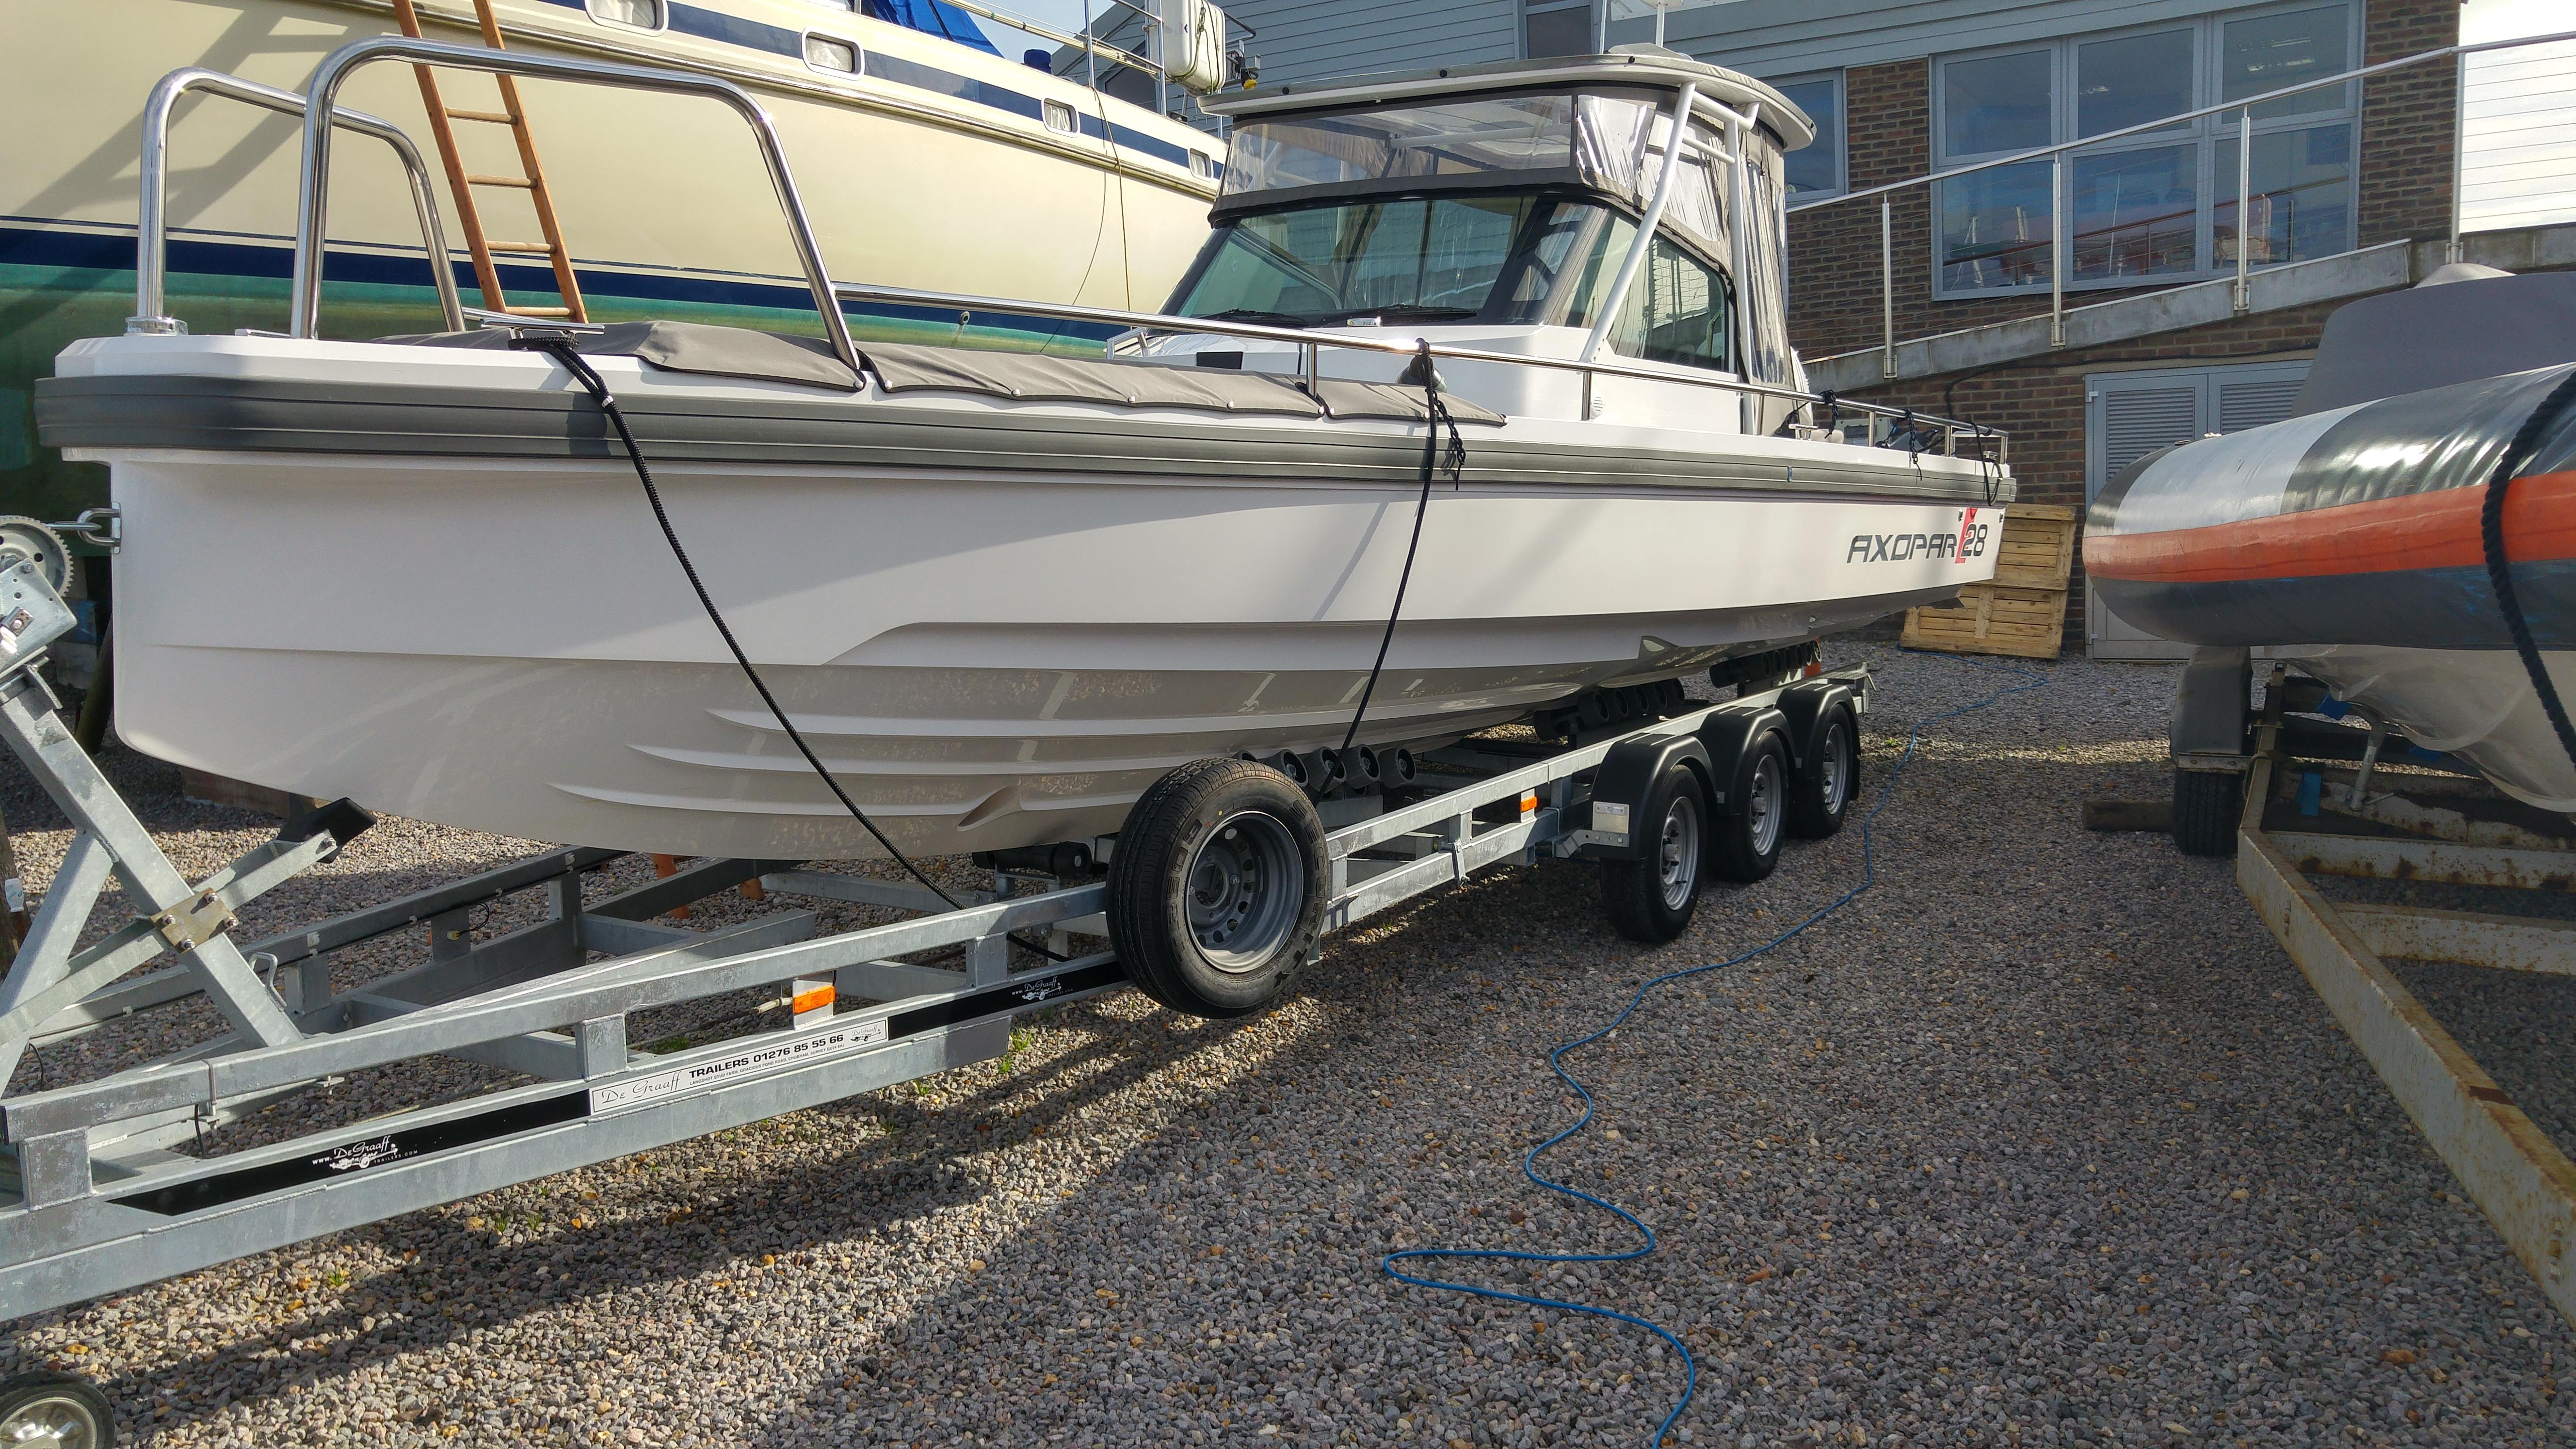 Performance Motorboat